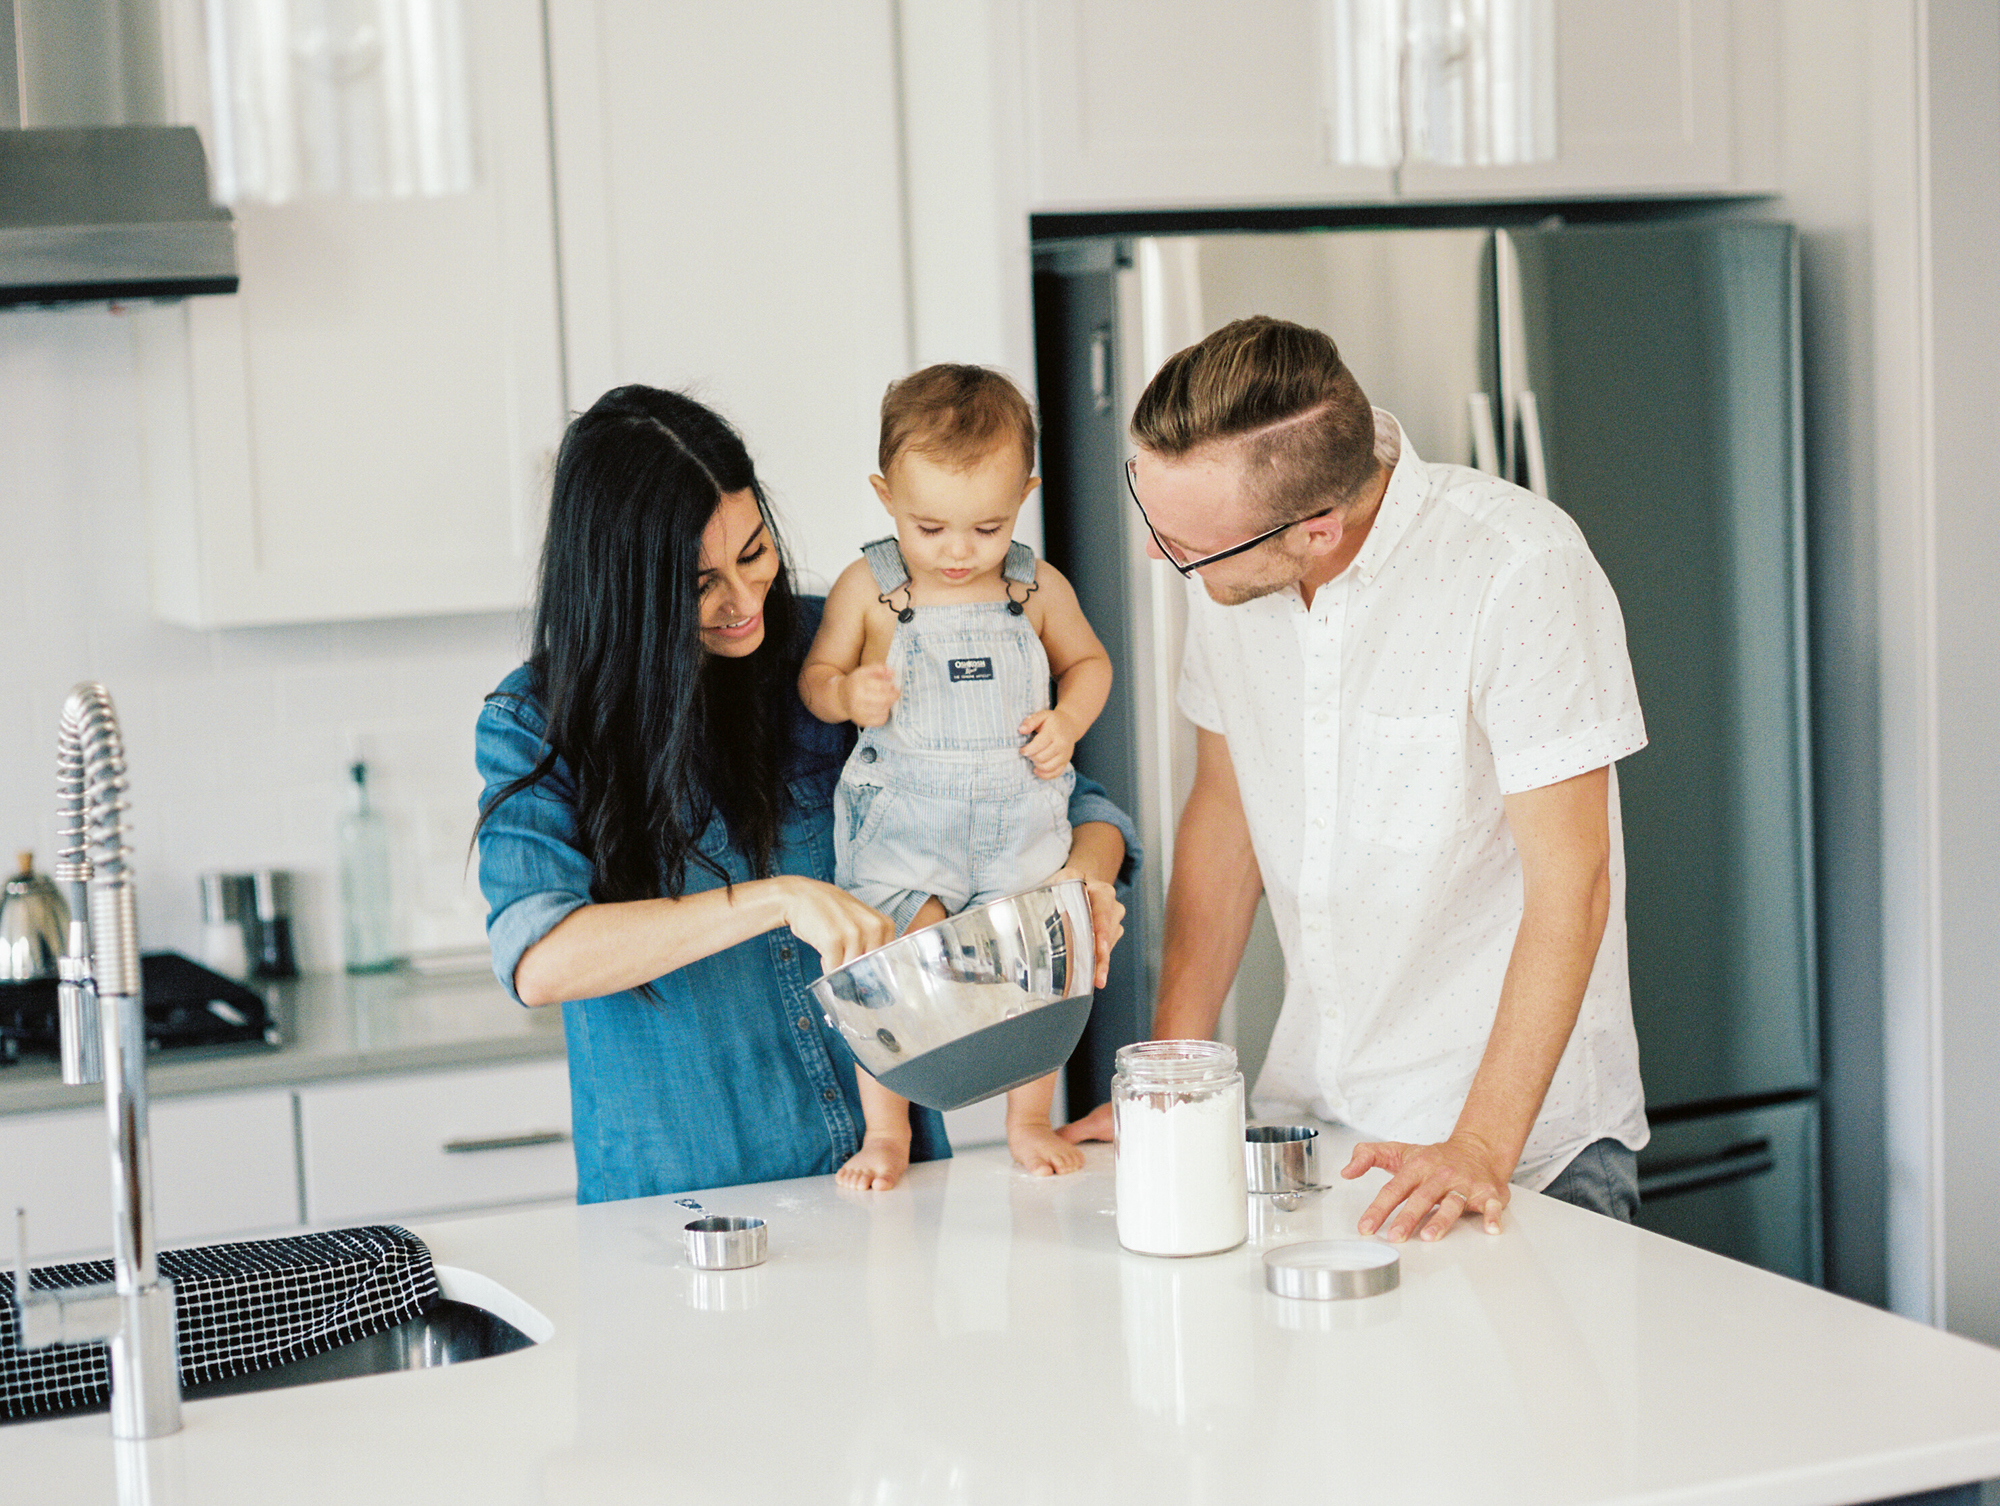 Lynchburg_DC_family_wedding_film_photographer_white_kitchen_baby_announcement-11.jpg